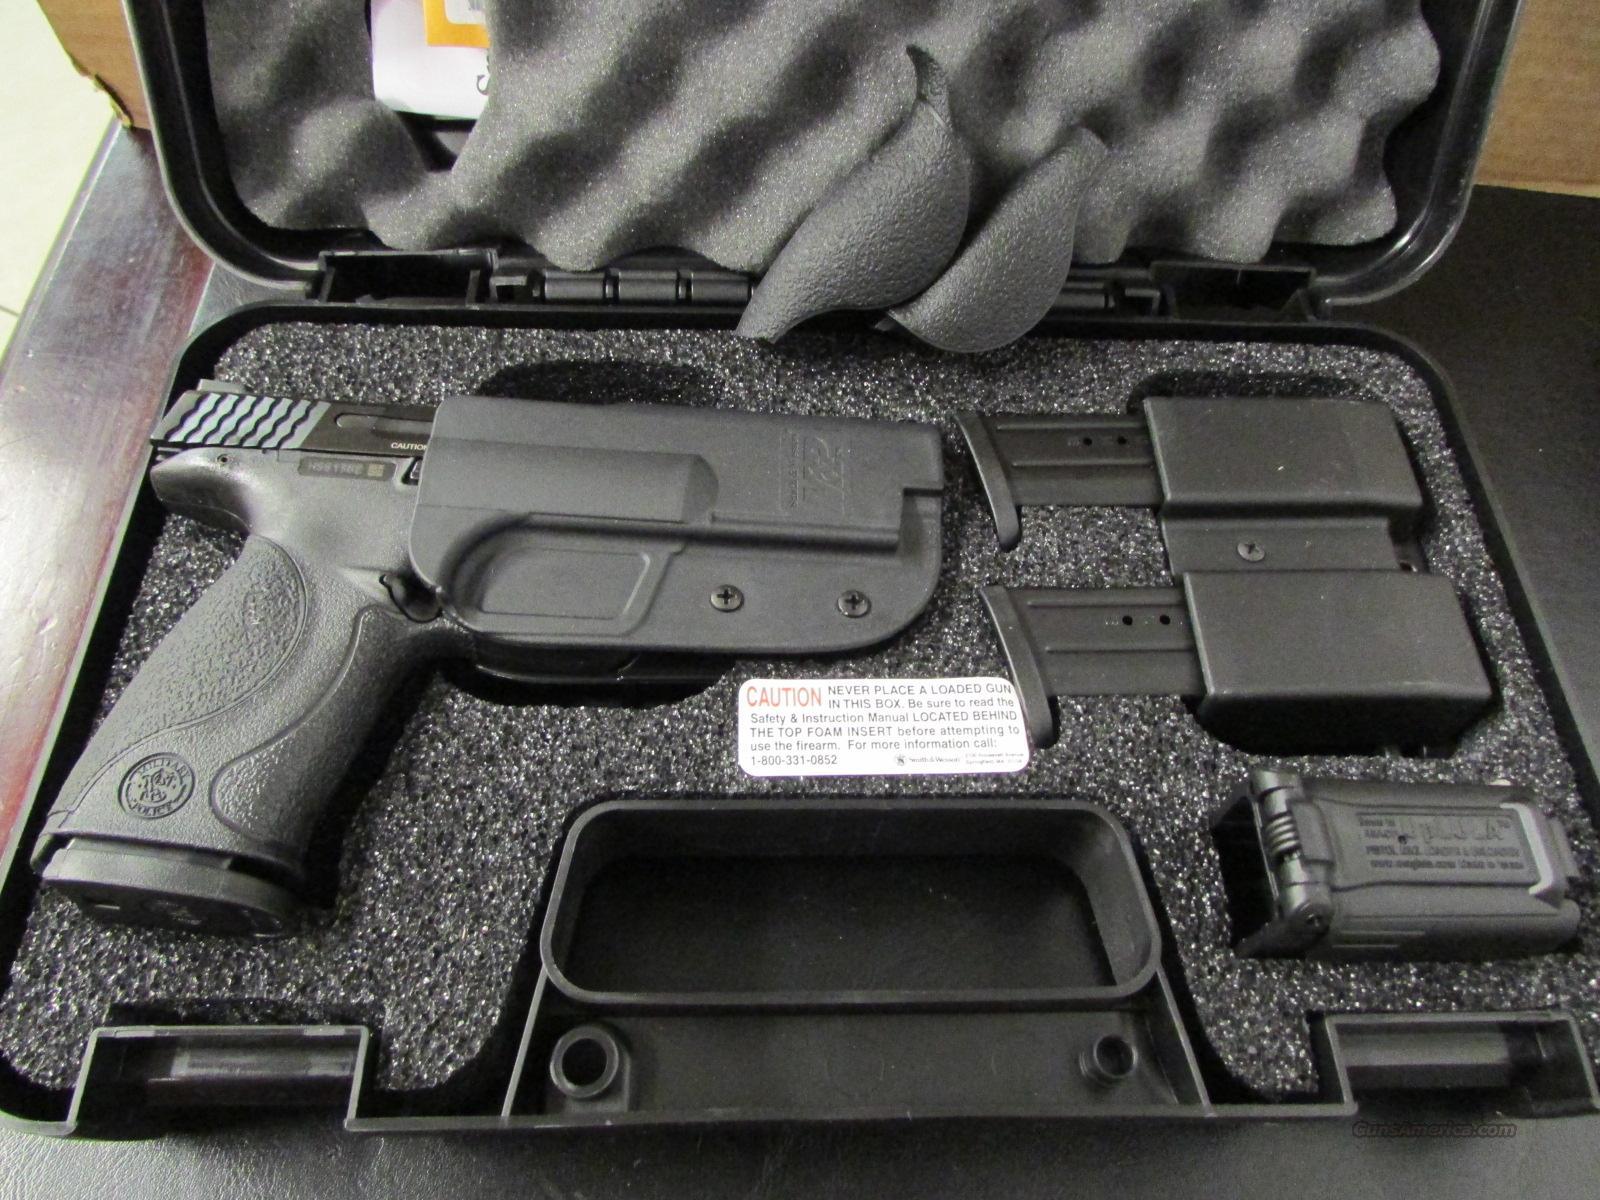 smith wesson m p 9mm carry and range kit 2093 for sale rh gunsamerica com Smith Wesson 40 Caliber Chrome Image Smith Wesson MP 40 Cal Pistol